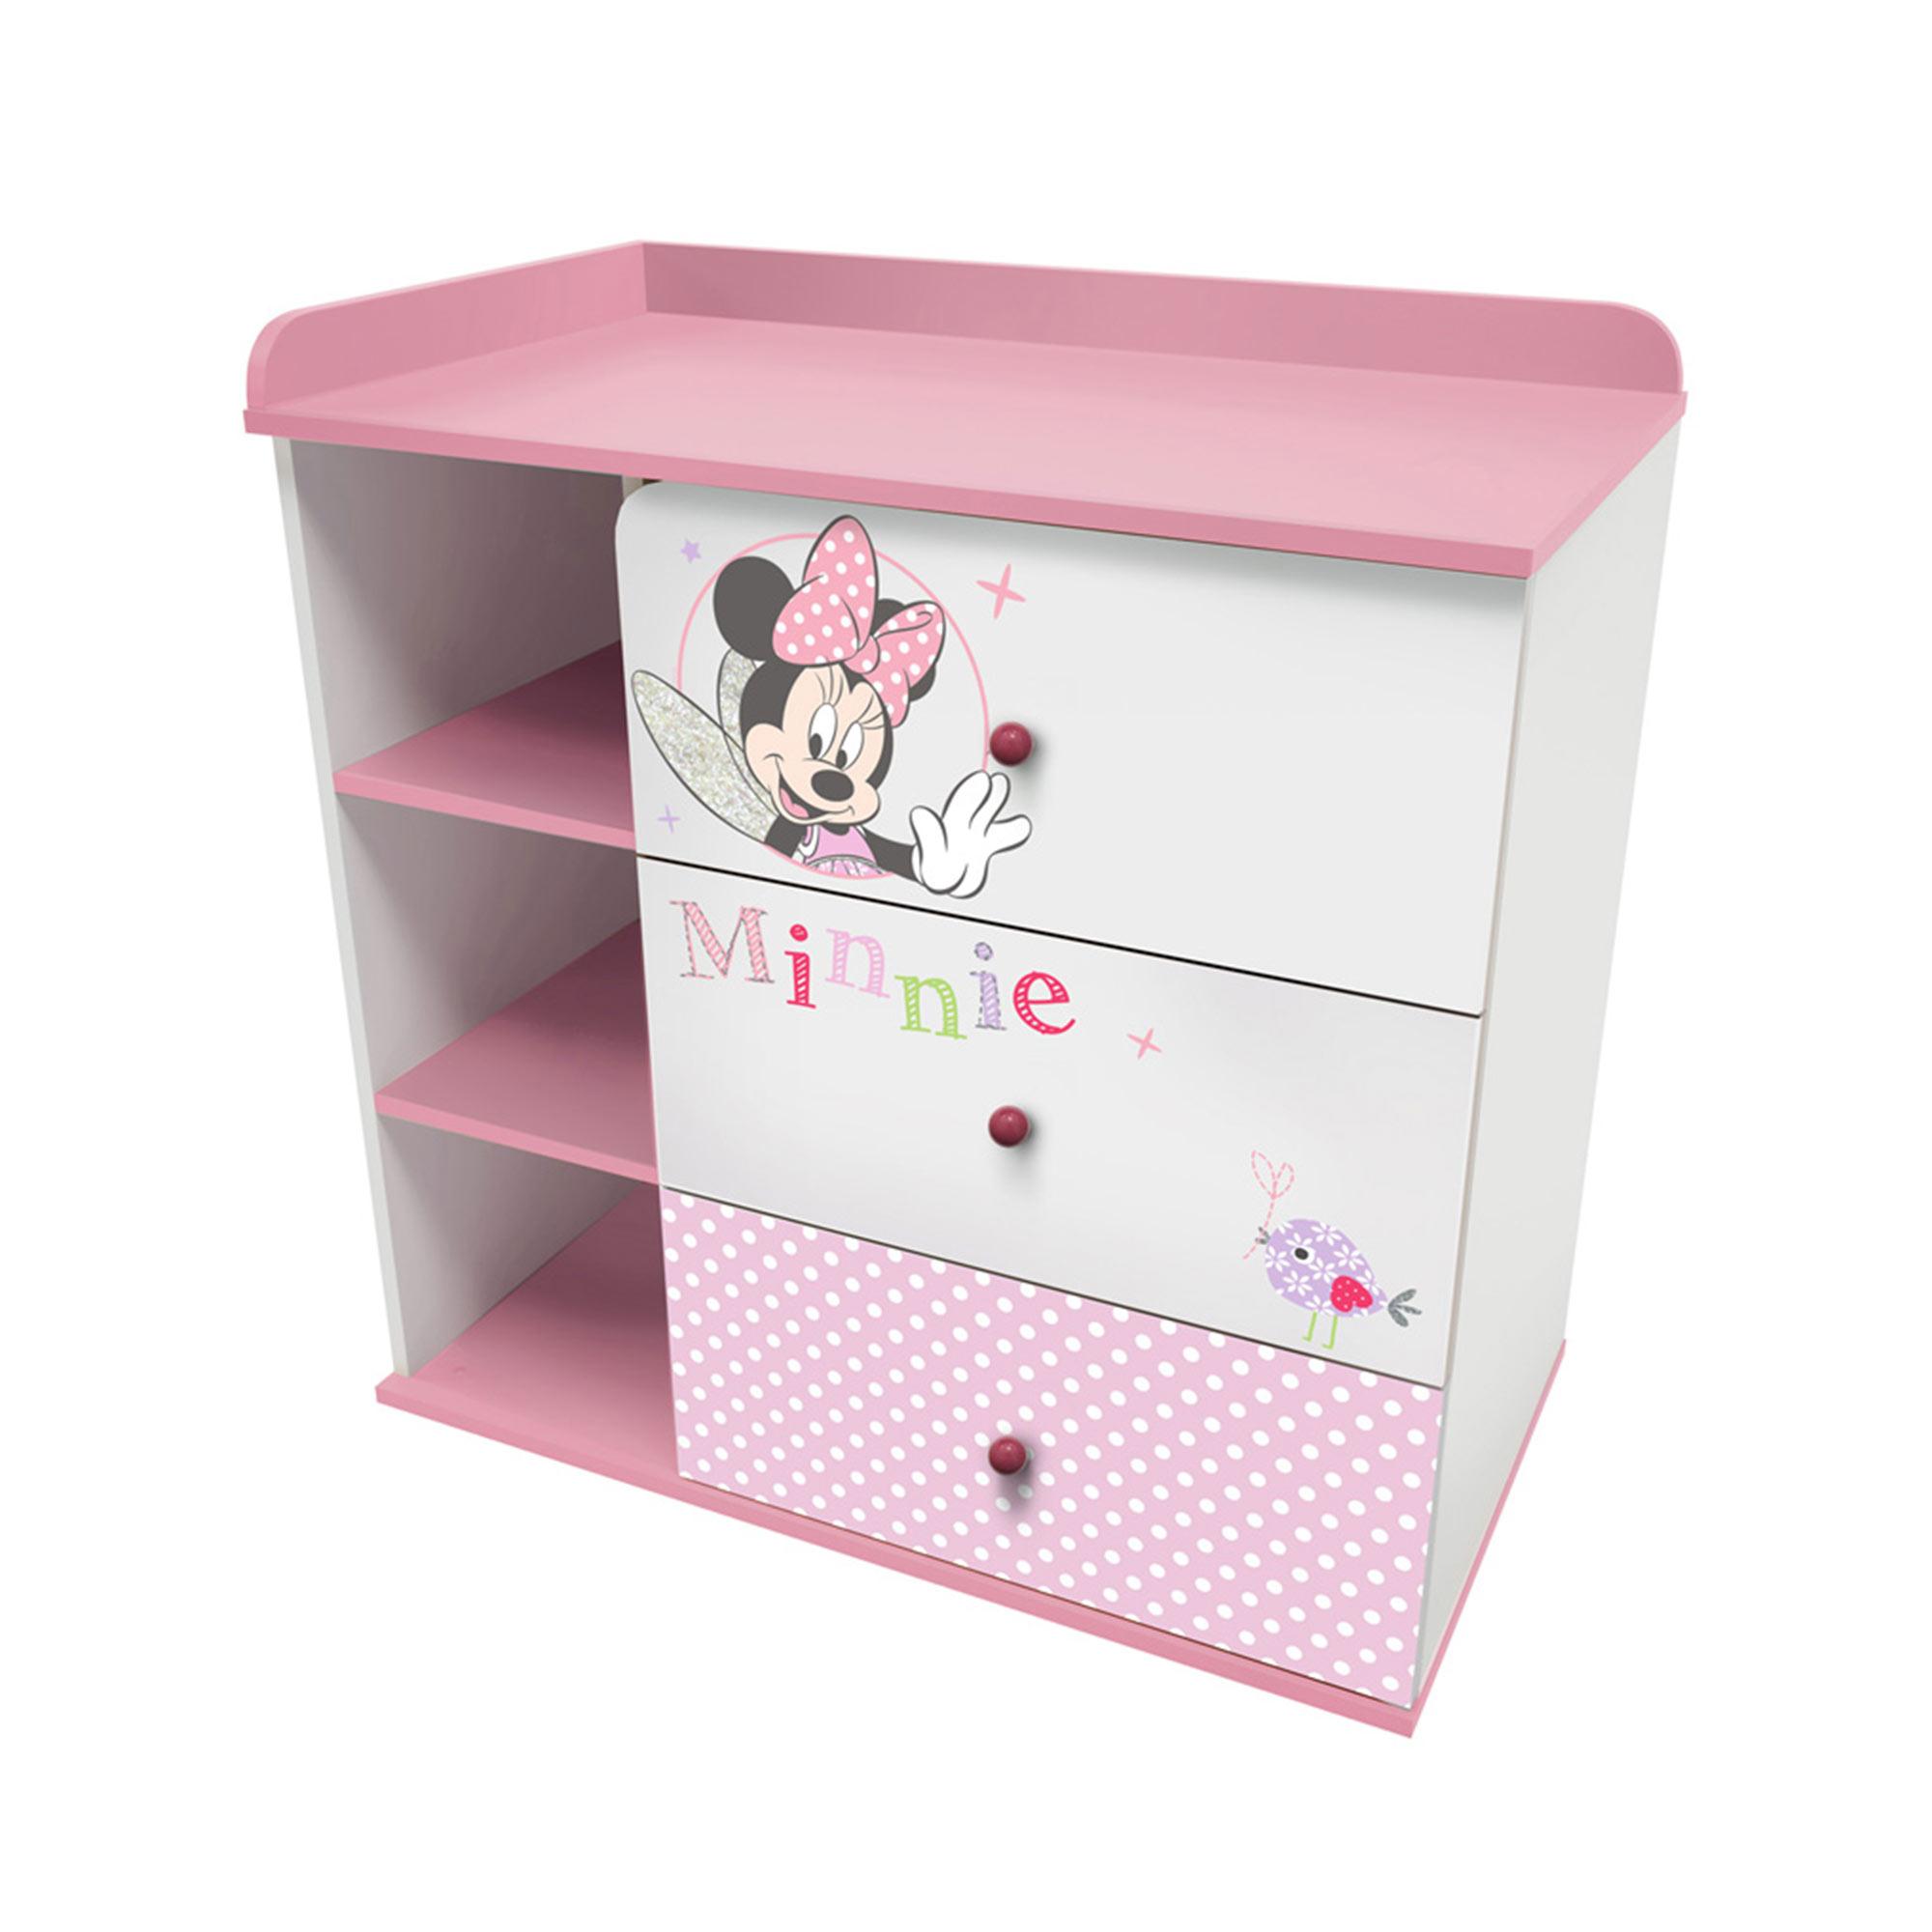 Комод Polini kids Disney baby 5090 Минни Маус-Фея , с 3 ящиками, белый-розовый 90х90х50